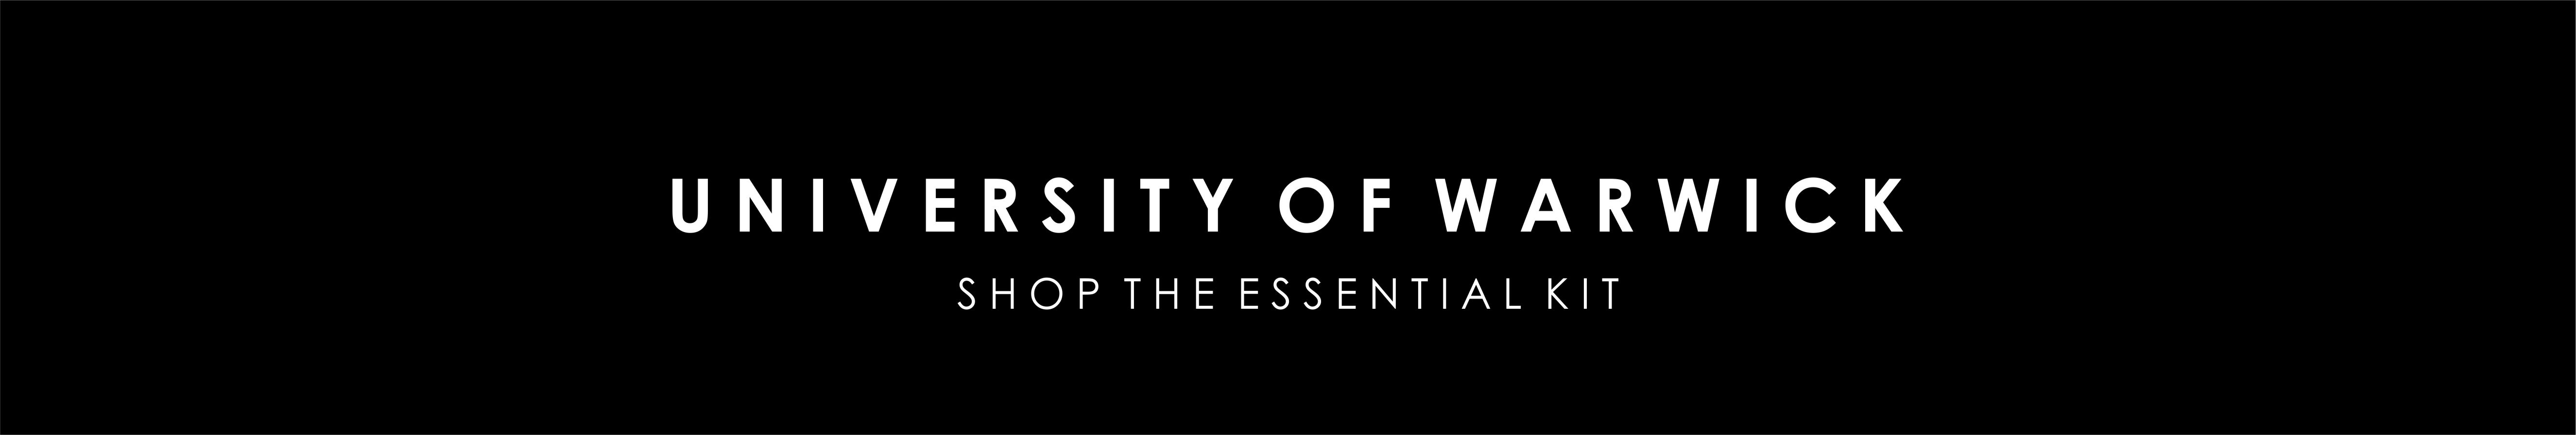 university-of-warwick-banner.jpg